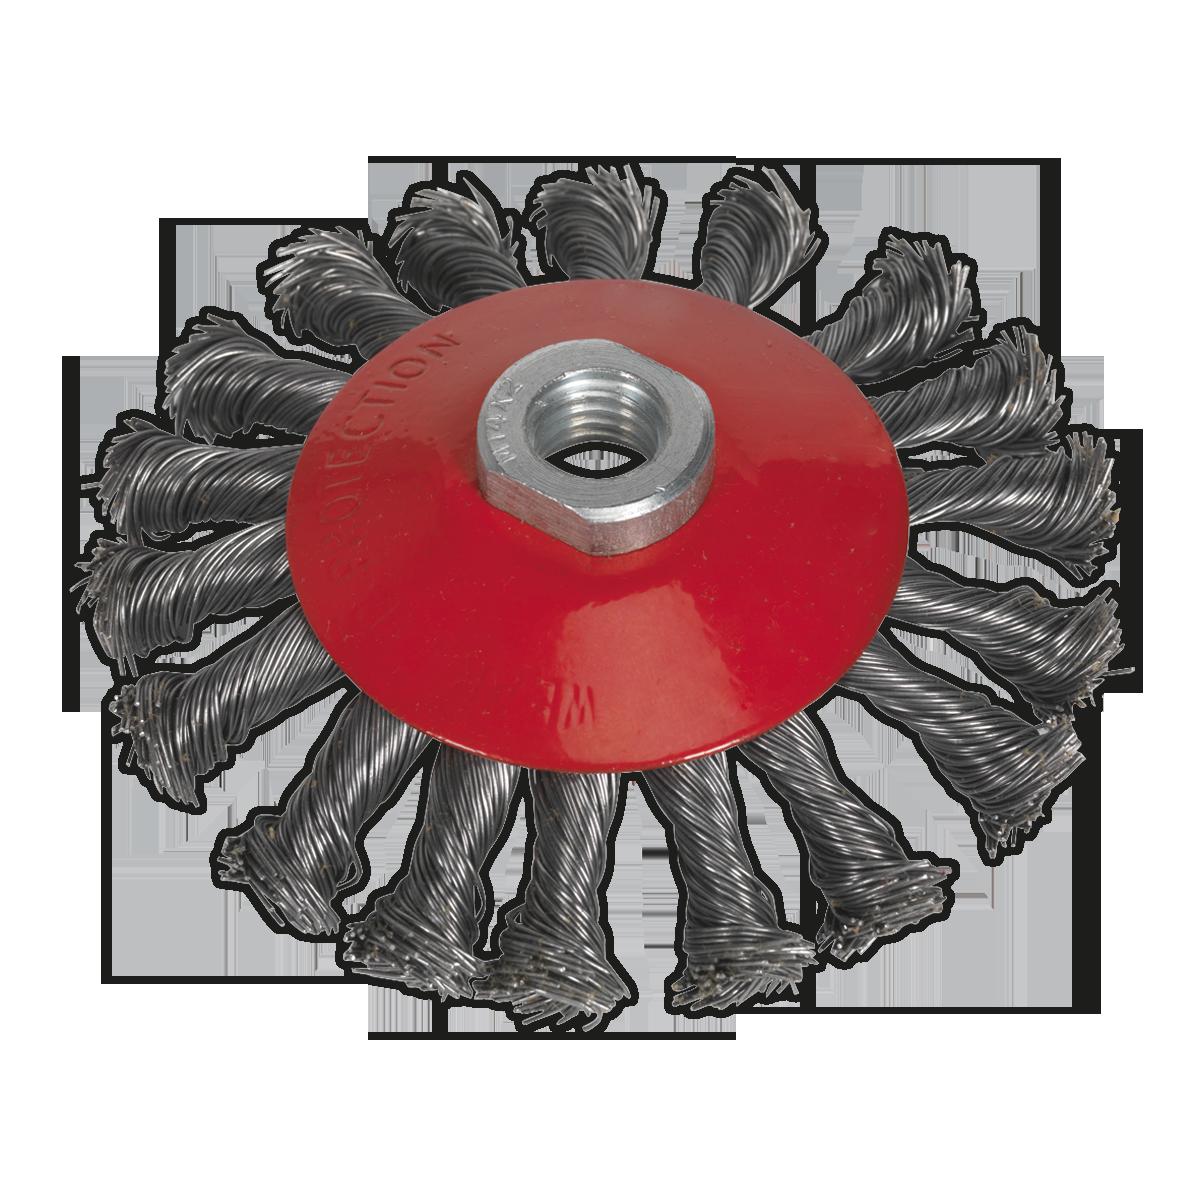 Ø115mm nylon brush wheel with M14 thread